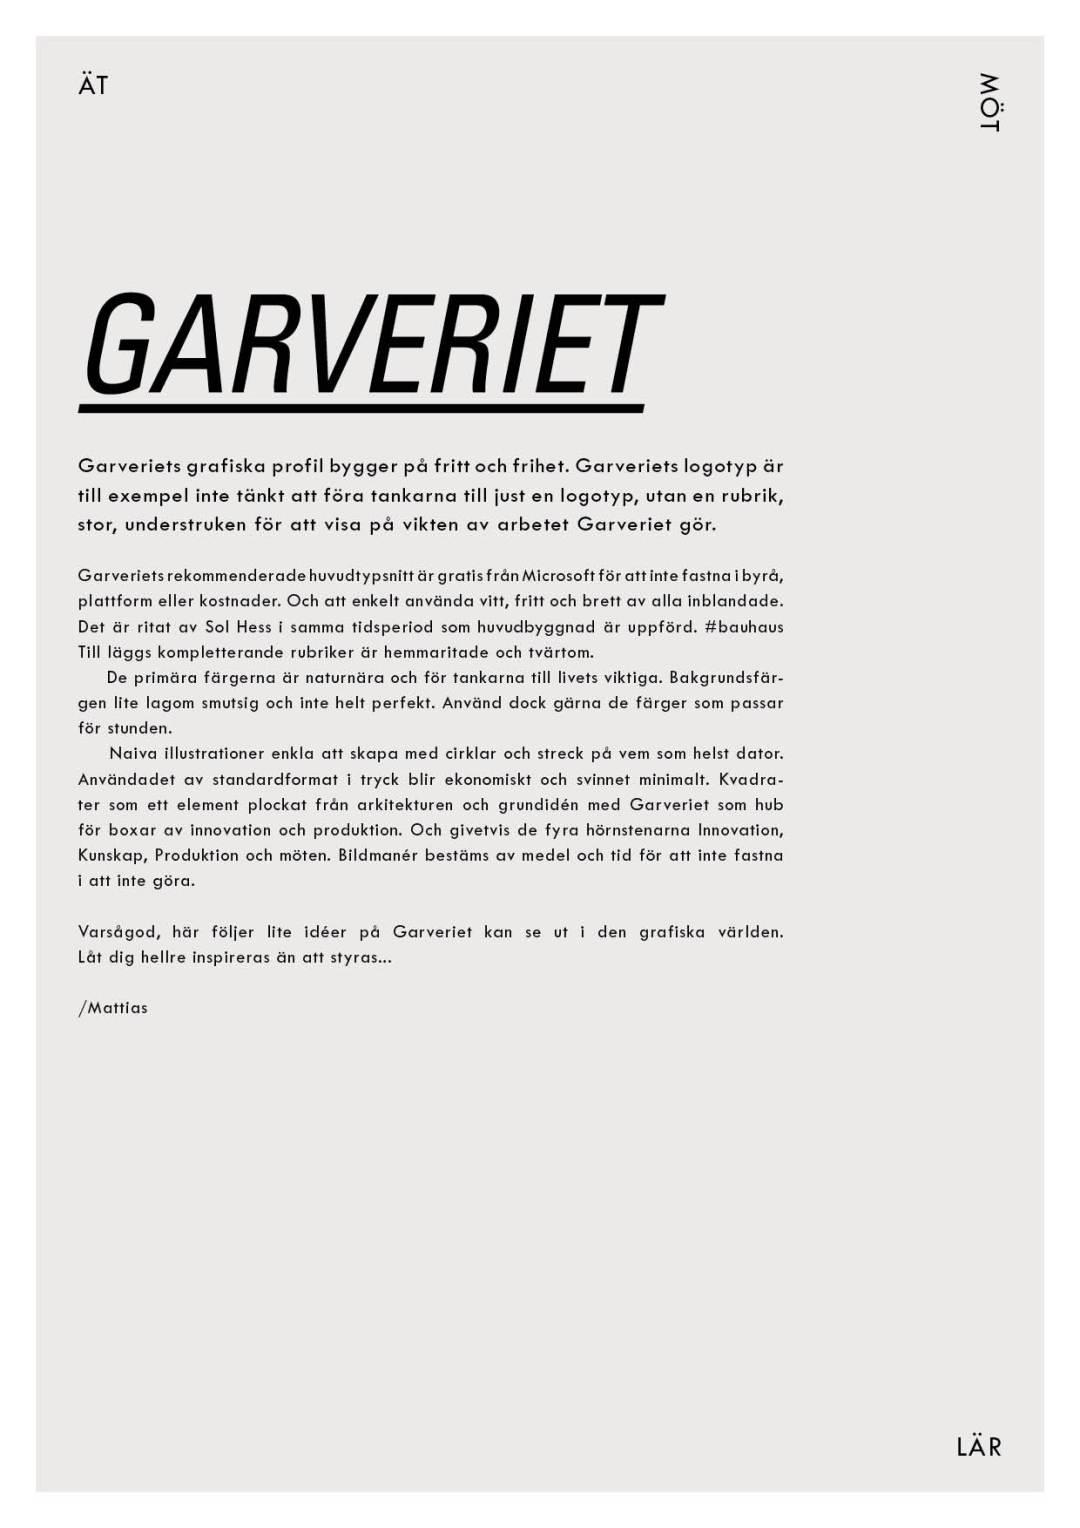 grafisk-profil-garveriet-20182